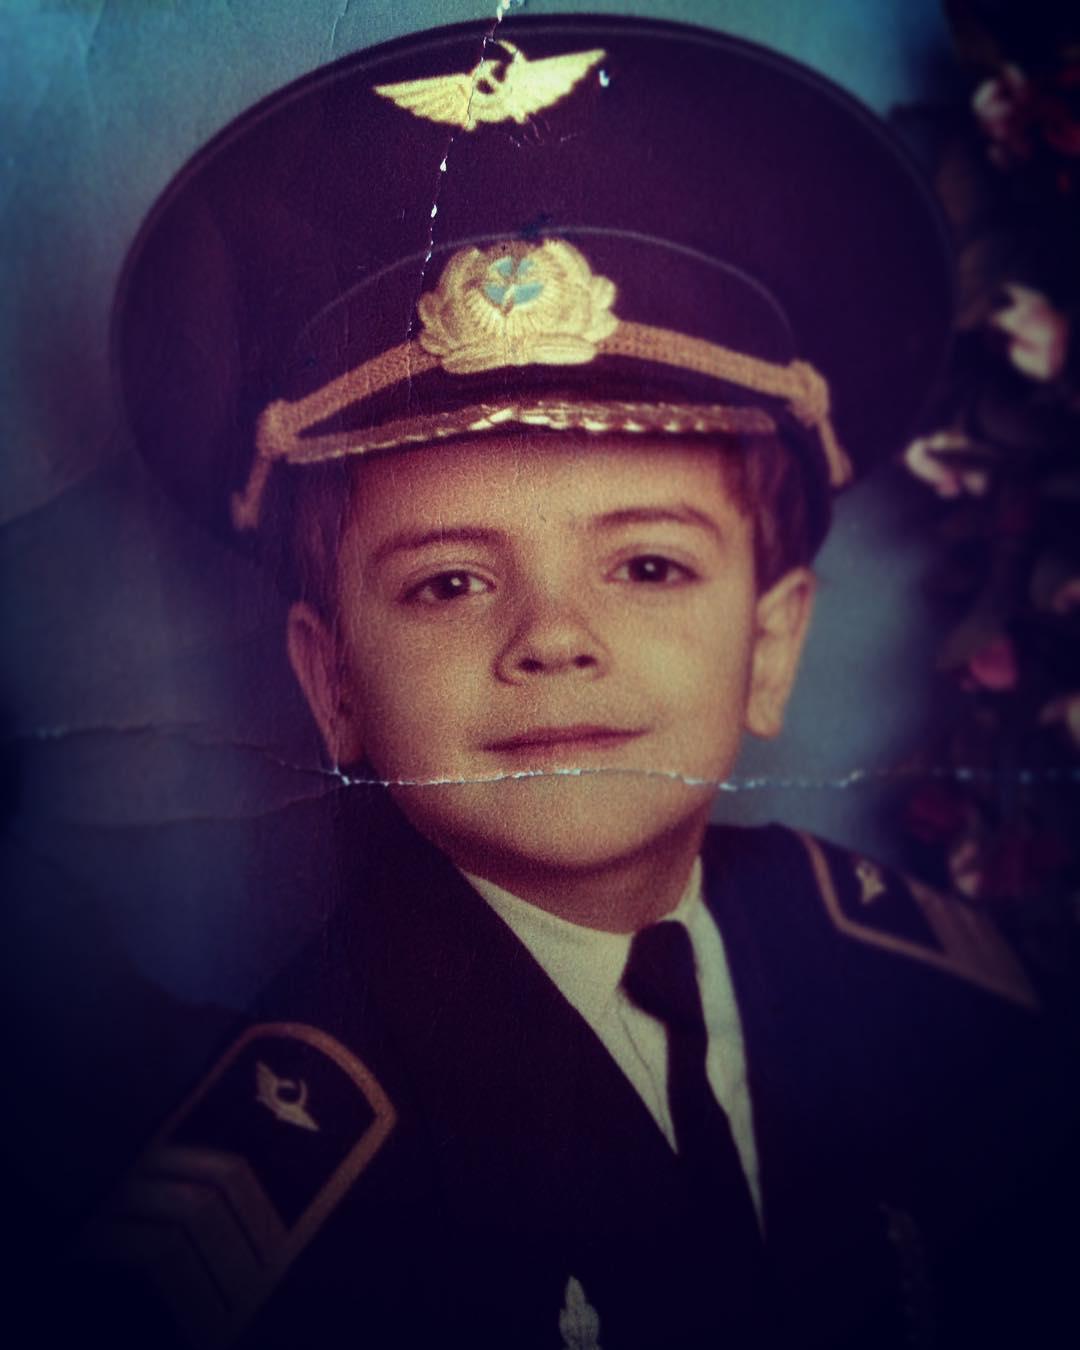 Антон Лапенко в детстве